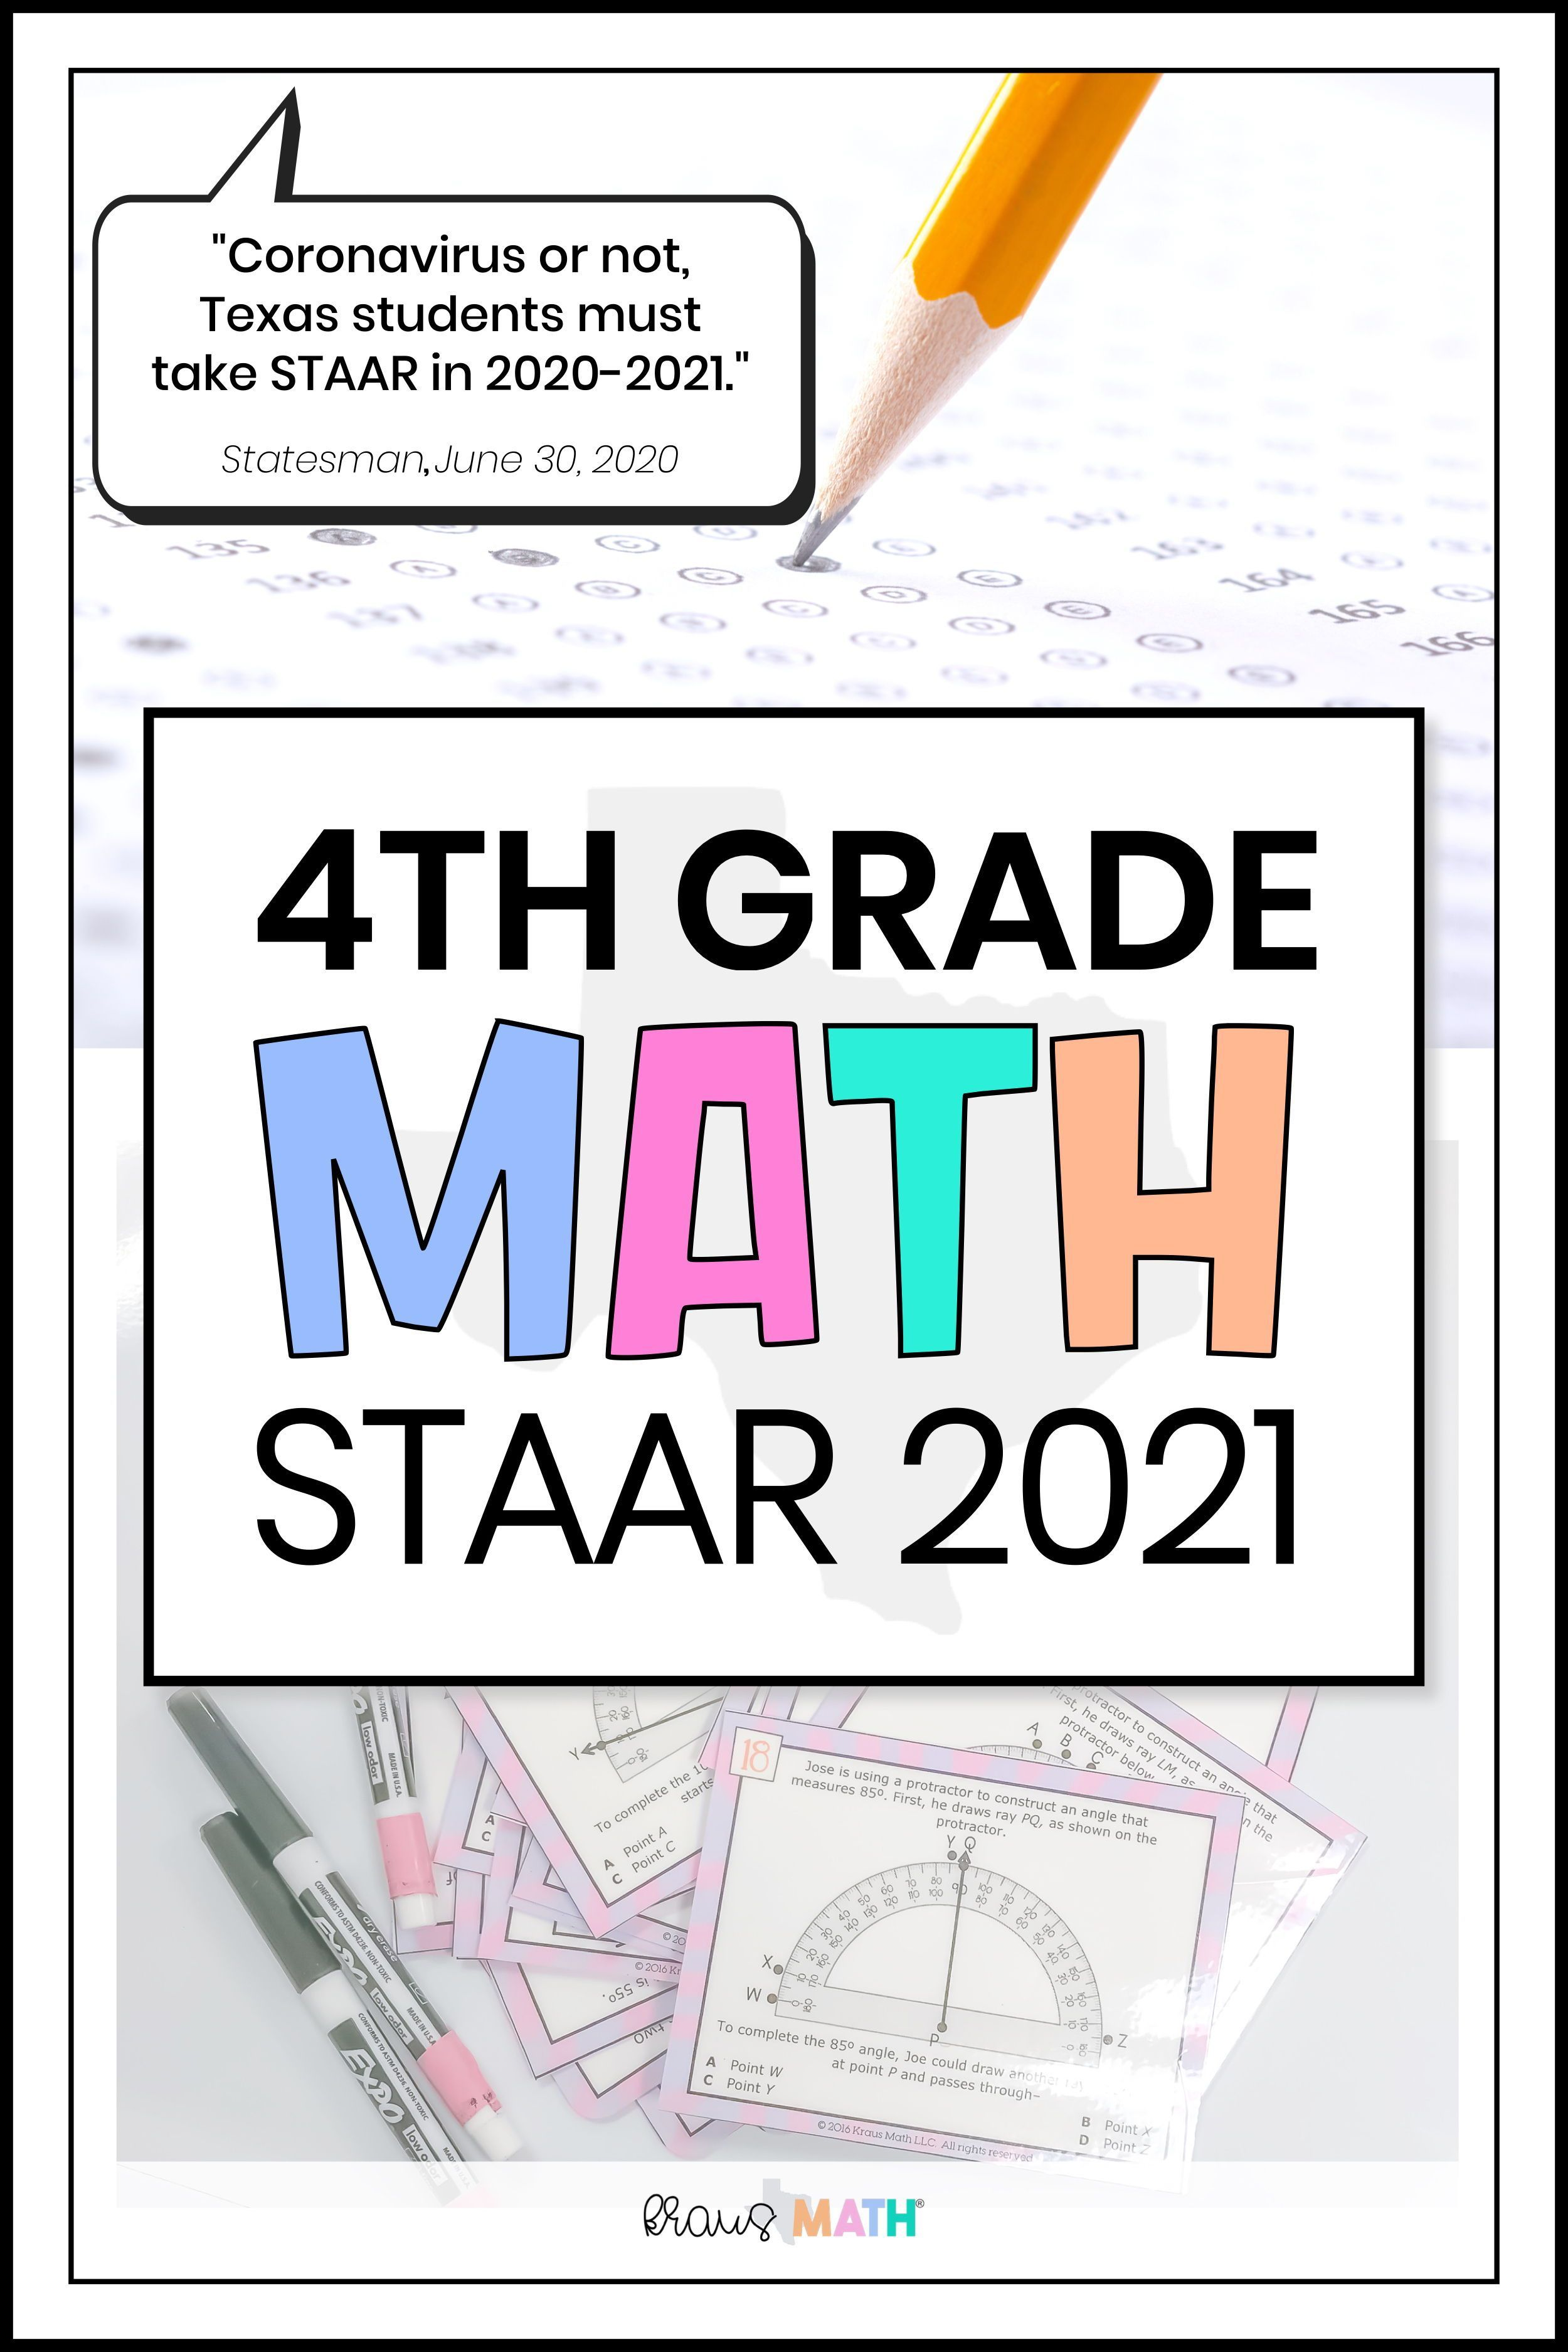 4th Grade Math Self Check Worksheets Full Year Bundle Kraus Math In 2020 4th Grade Math Solving Word Problems Math [ 3750 x 2500 Pixel ]